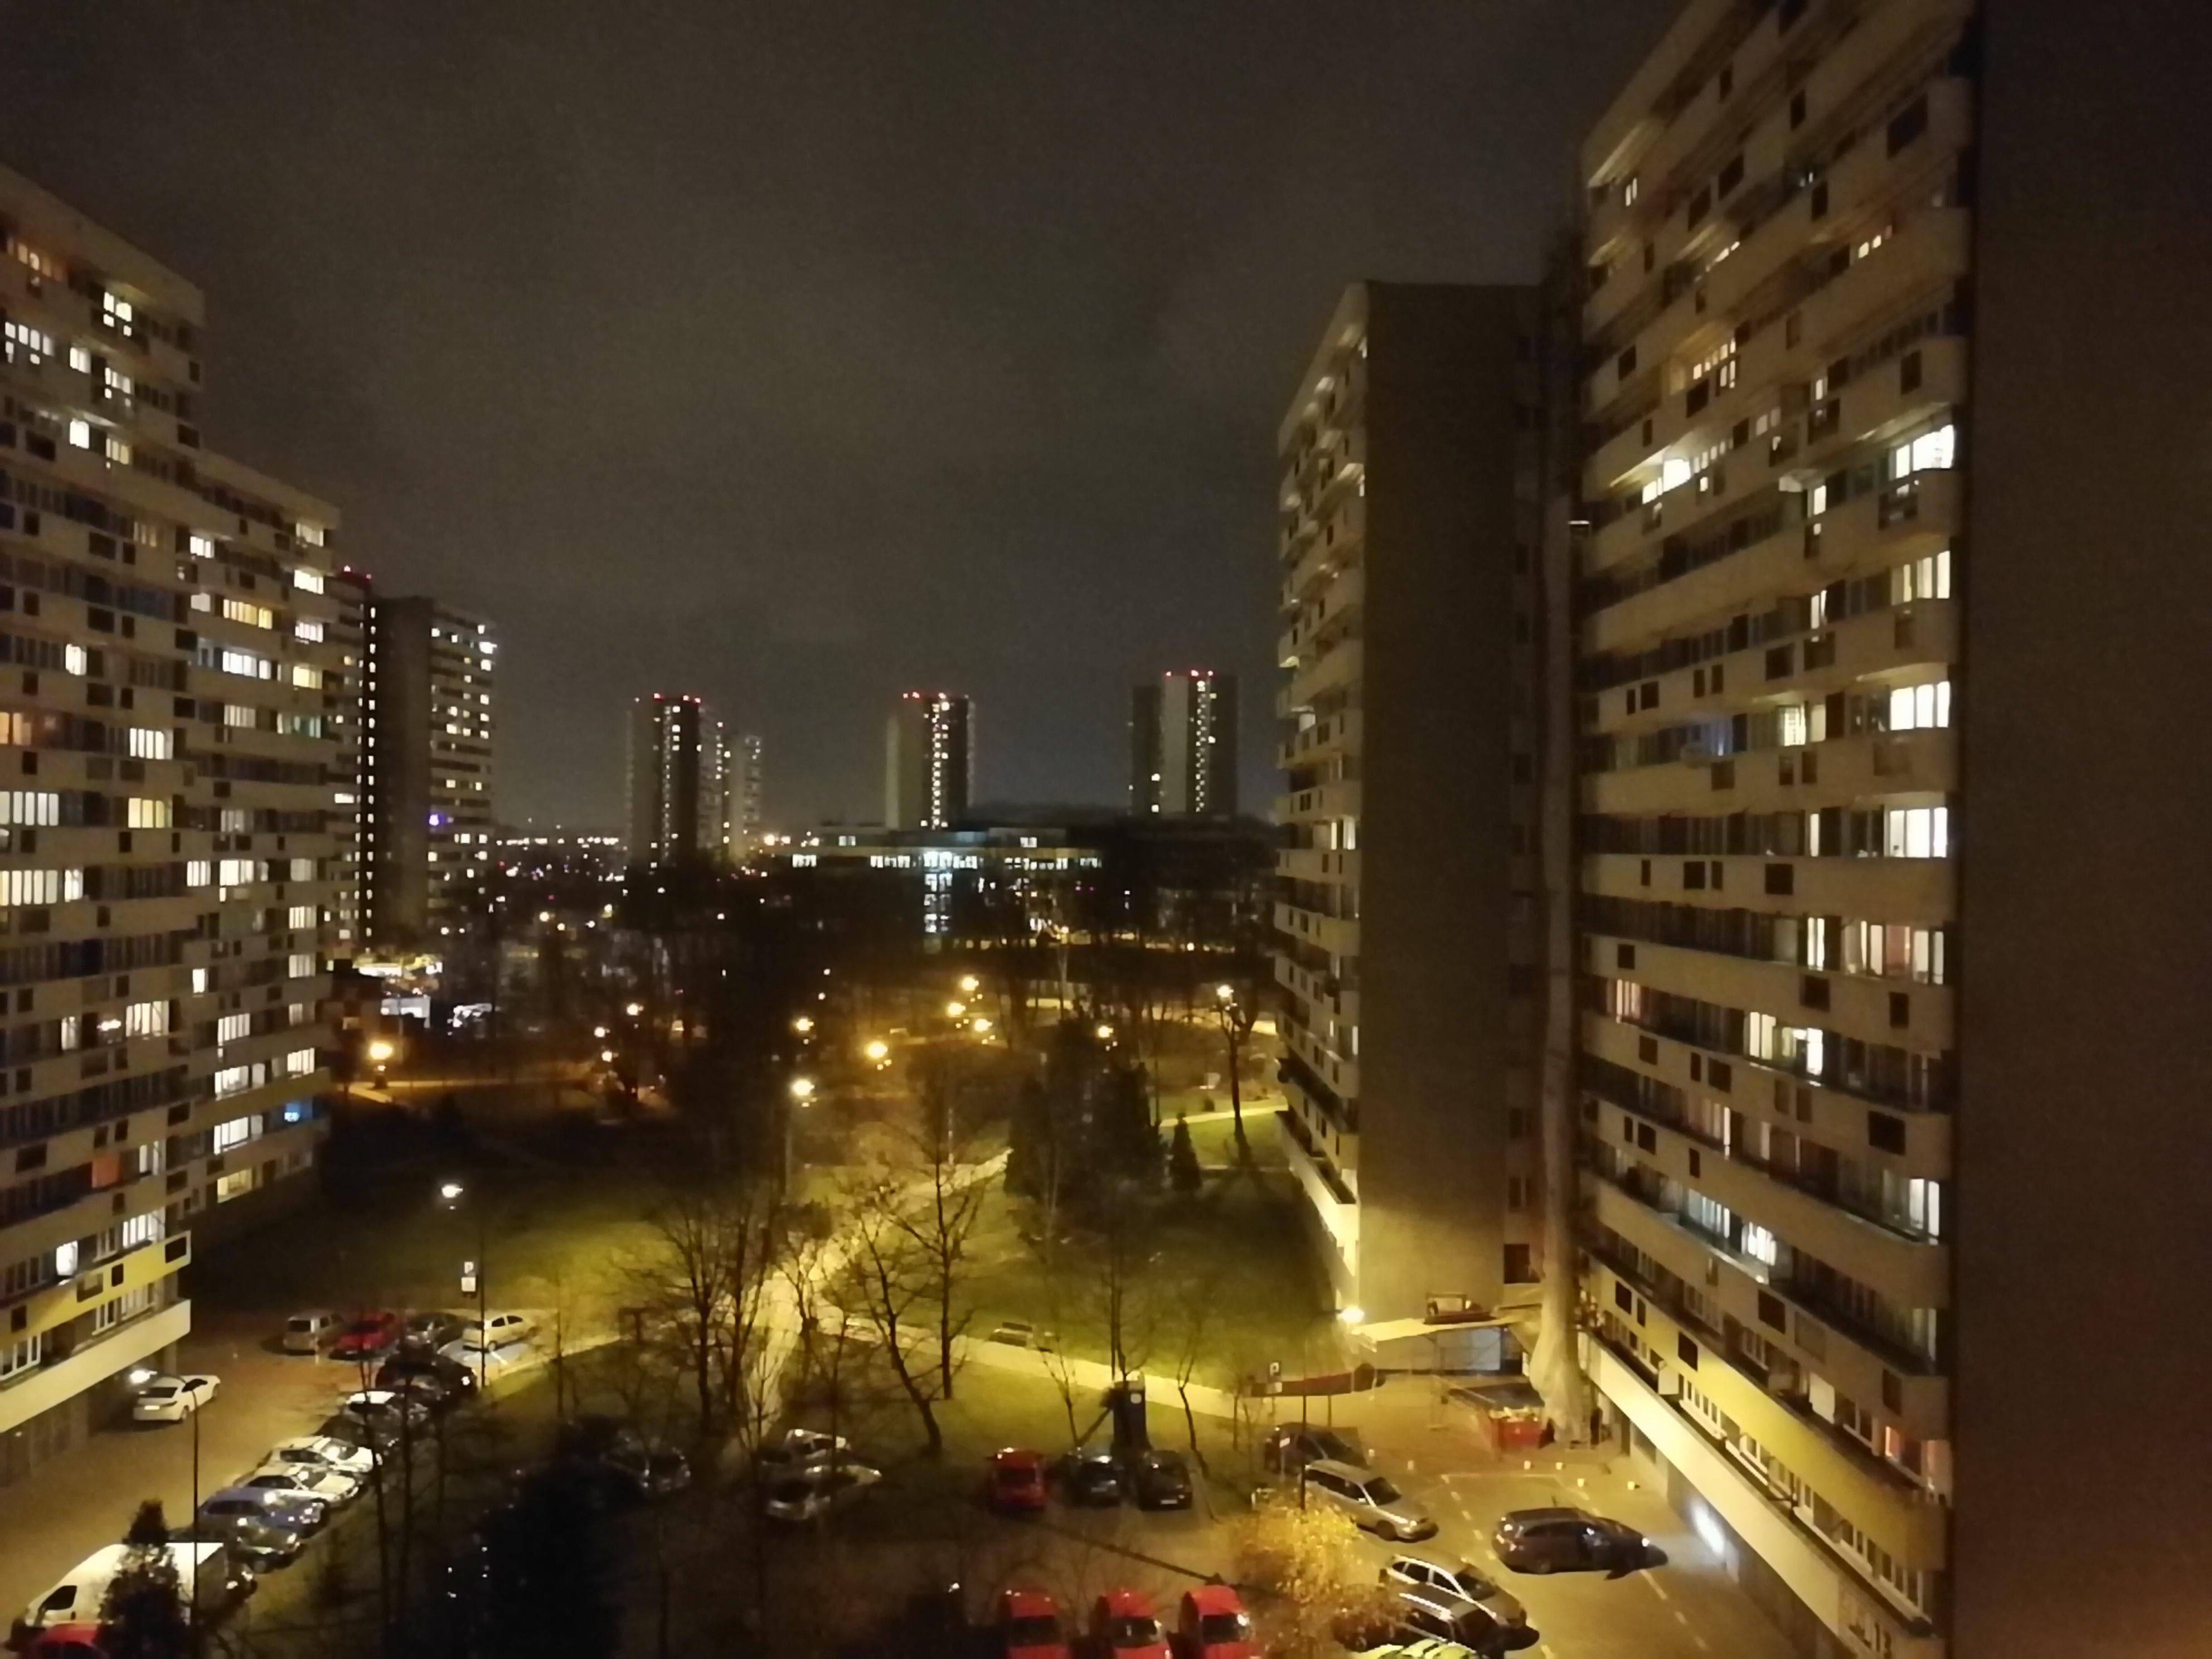 Zdjęcia nocne - Huawei P10 Plus